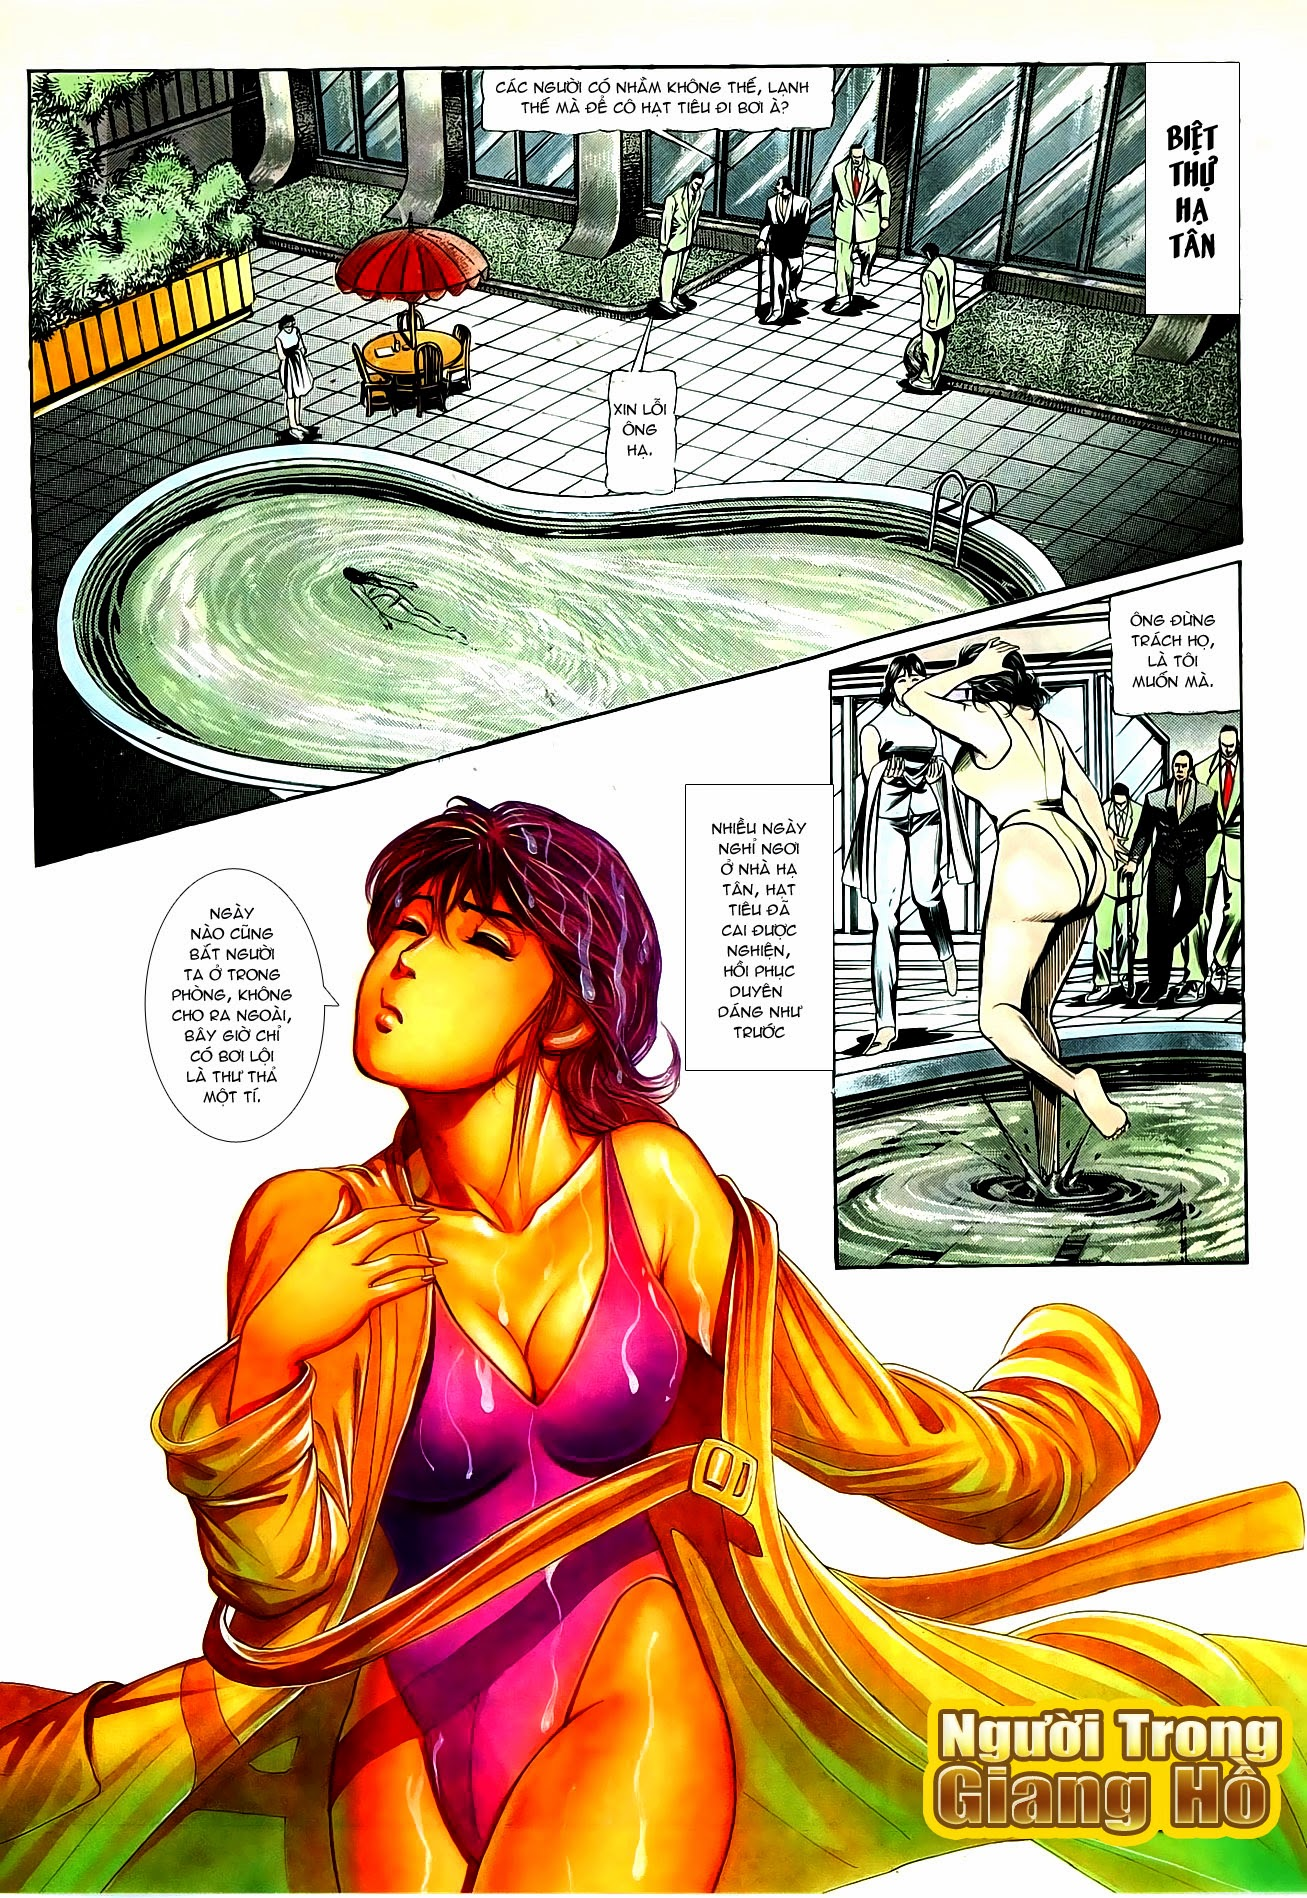 Người Trong Giang Hồ chapter 86: săn báo trang 5